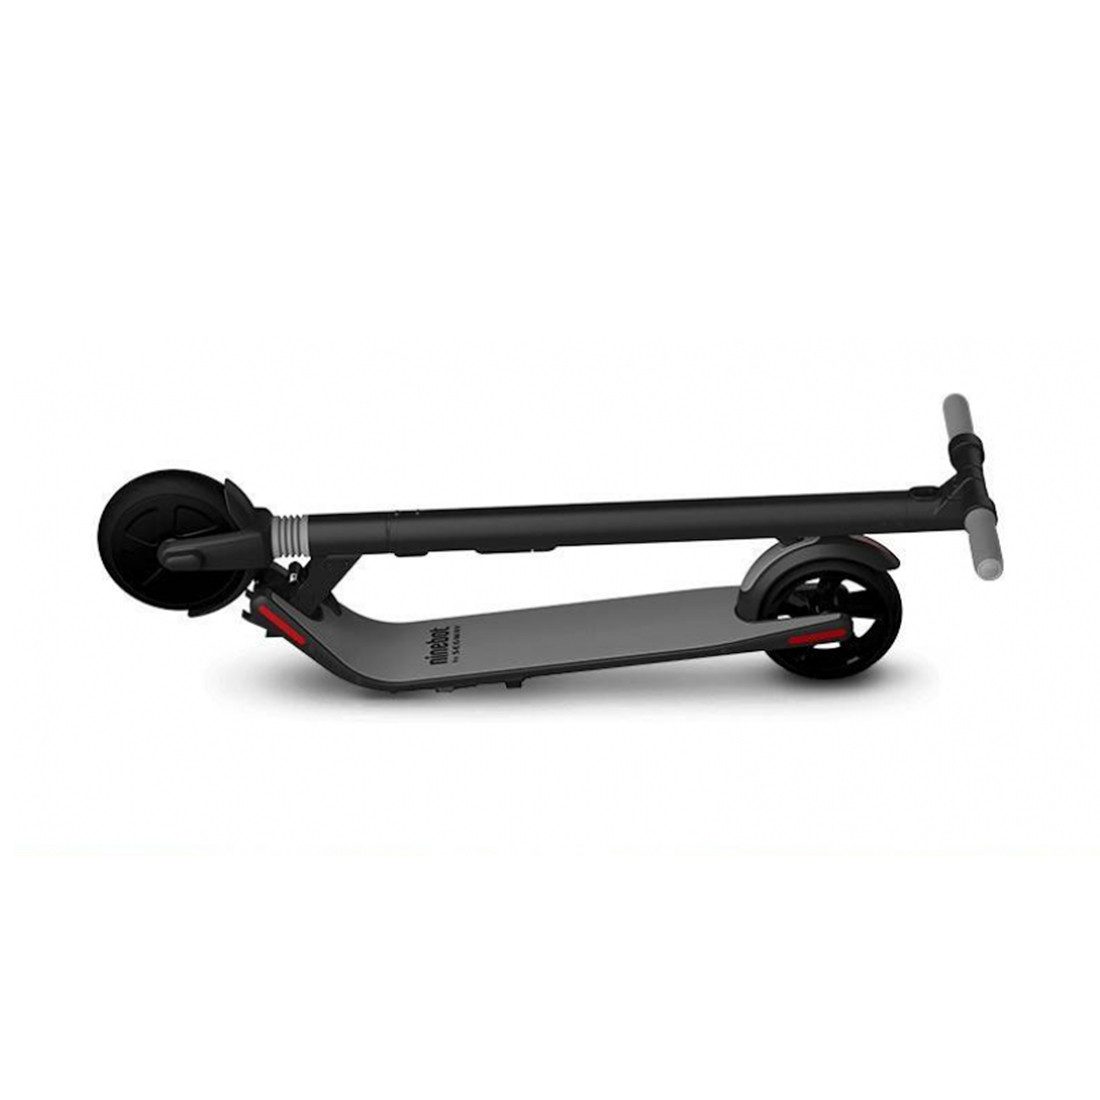 Электросамокат Ninebot KickScooter ES1 Темно-серый - фото 4